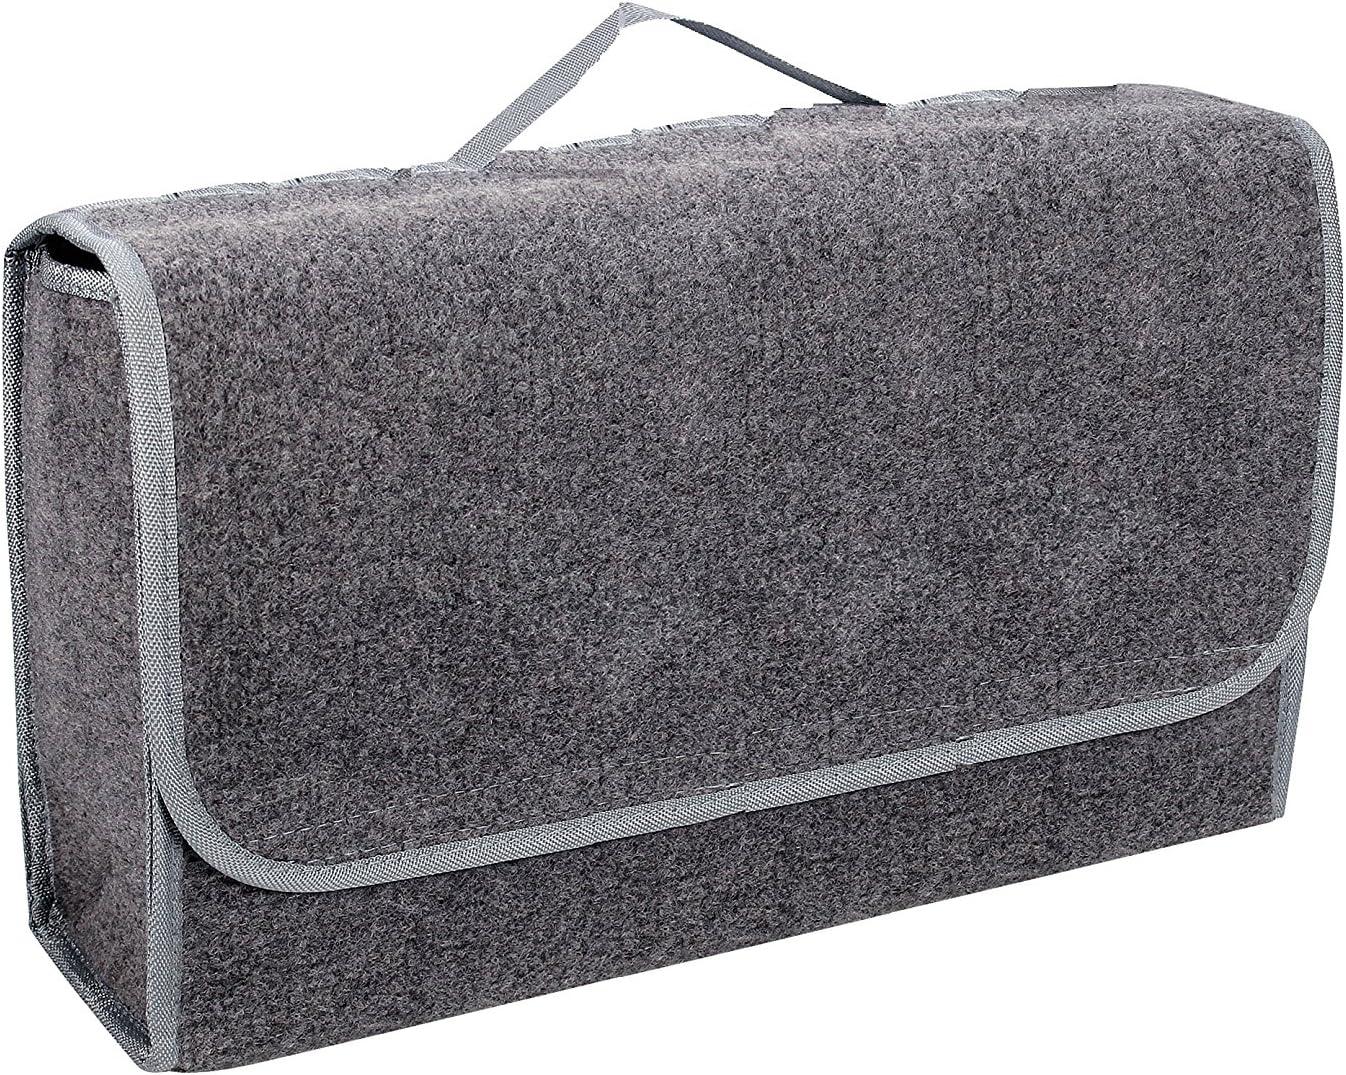 INTERINNOV Bolsa para Maletero Fabricada en Fieltro con Velcro (48 x 16 x 32 cm), Color Gris